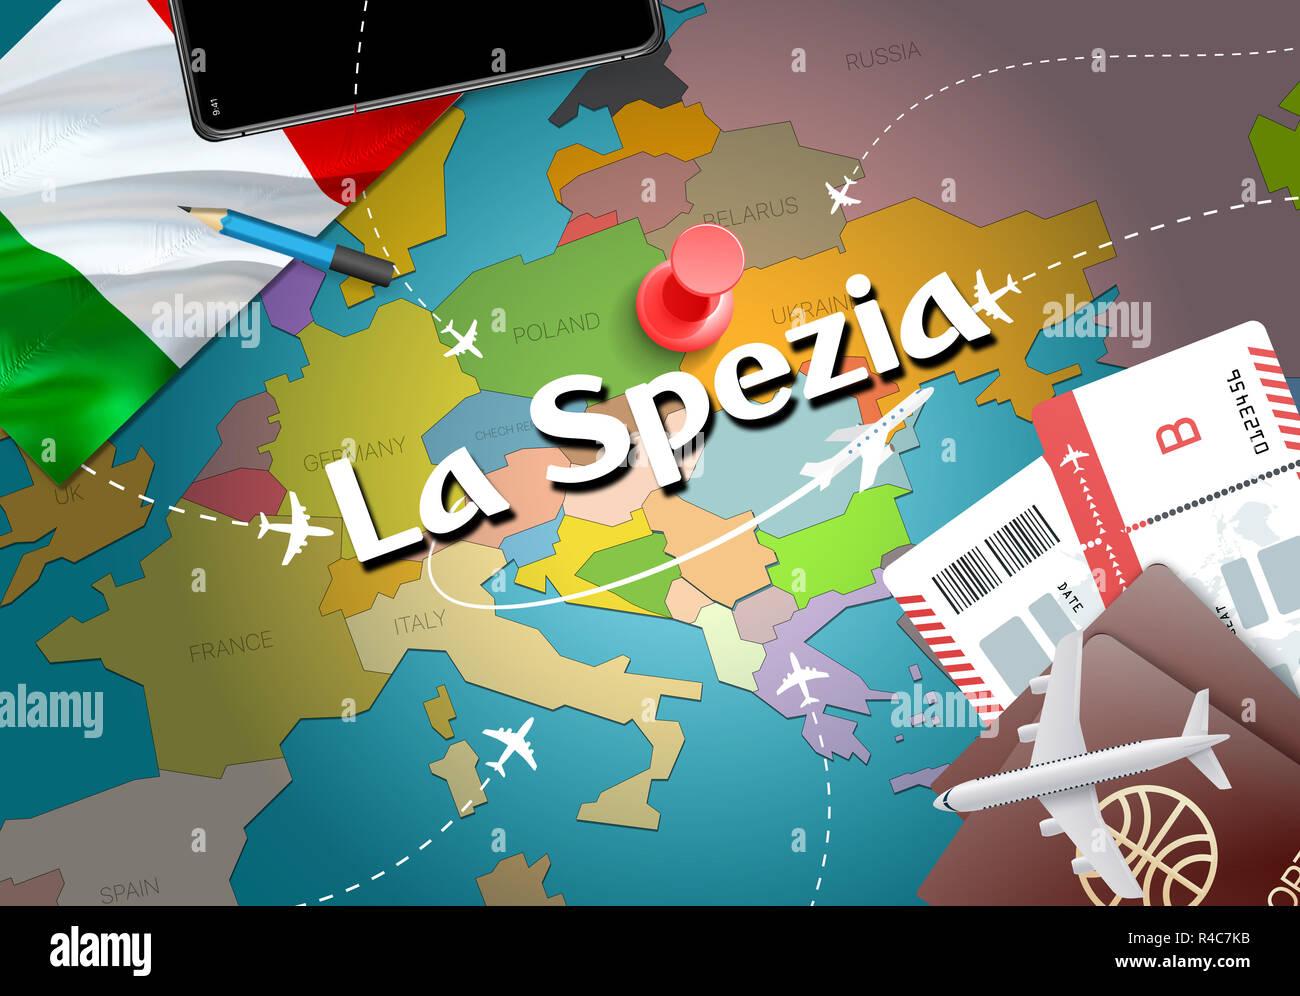 La Spezia City Travel And Tourism Destination Concept Italy